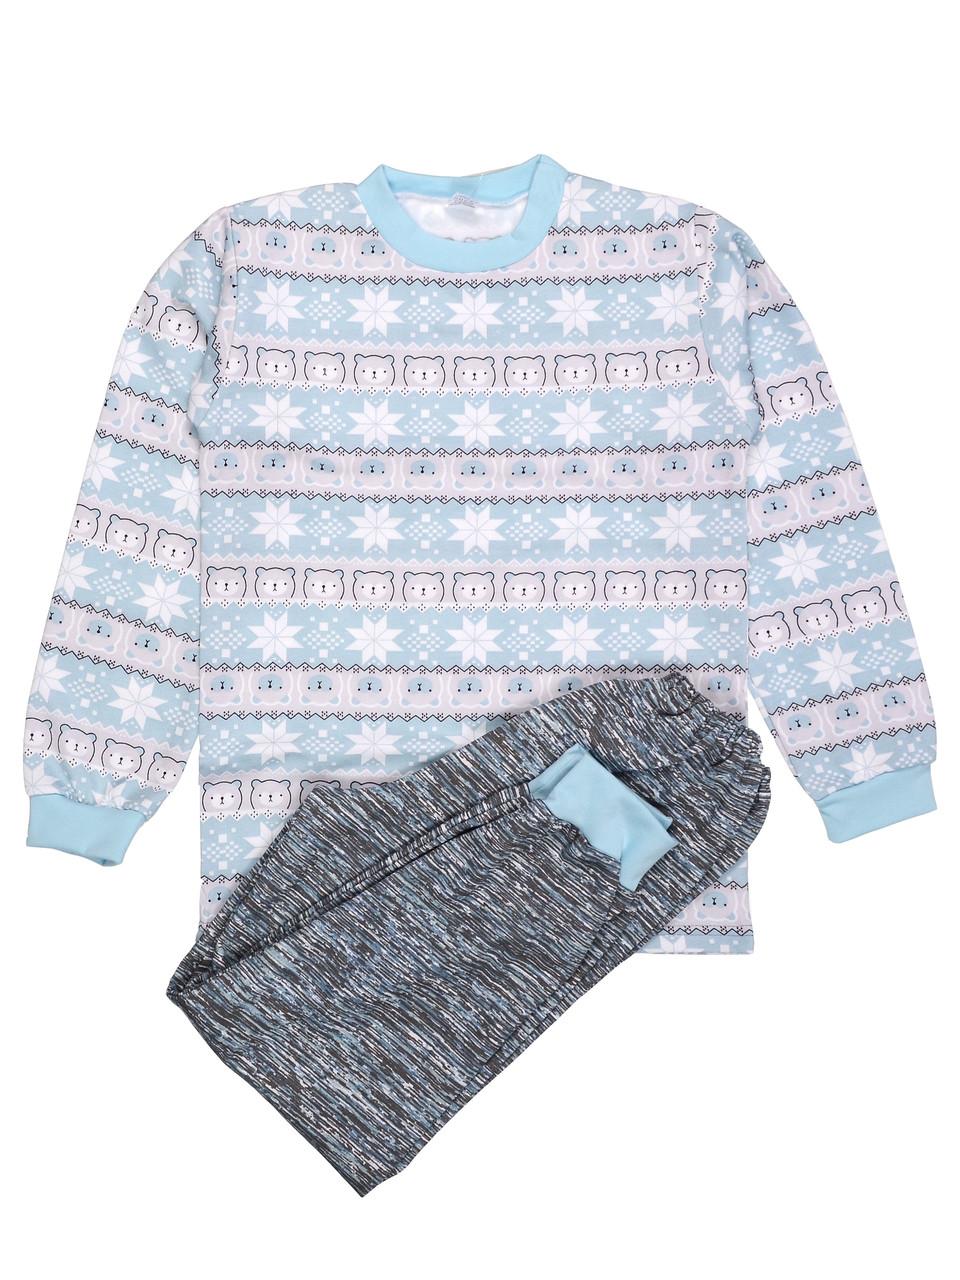 Теплая пижама детская (футер), принт зима